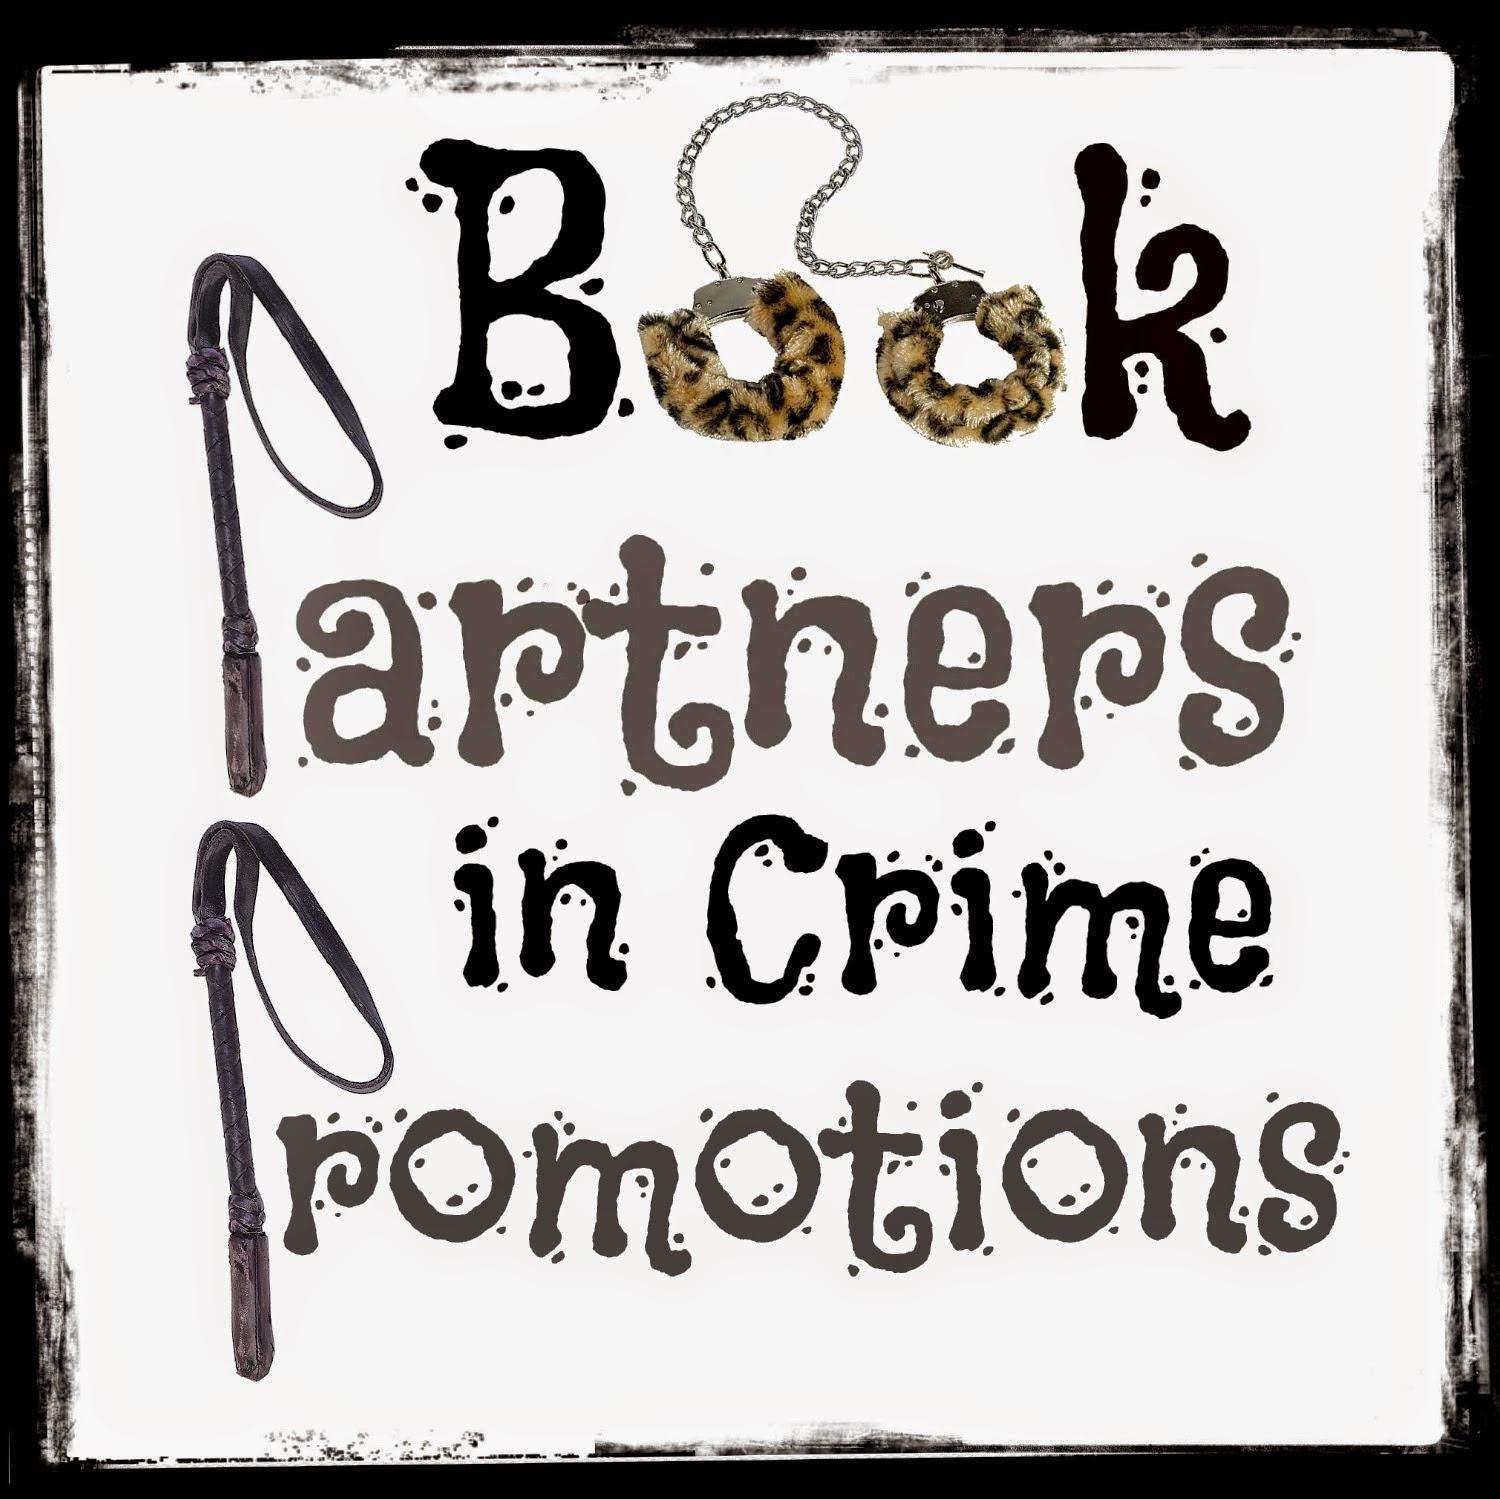 http://www.bookpartnersincrimepromotions.com/